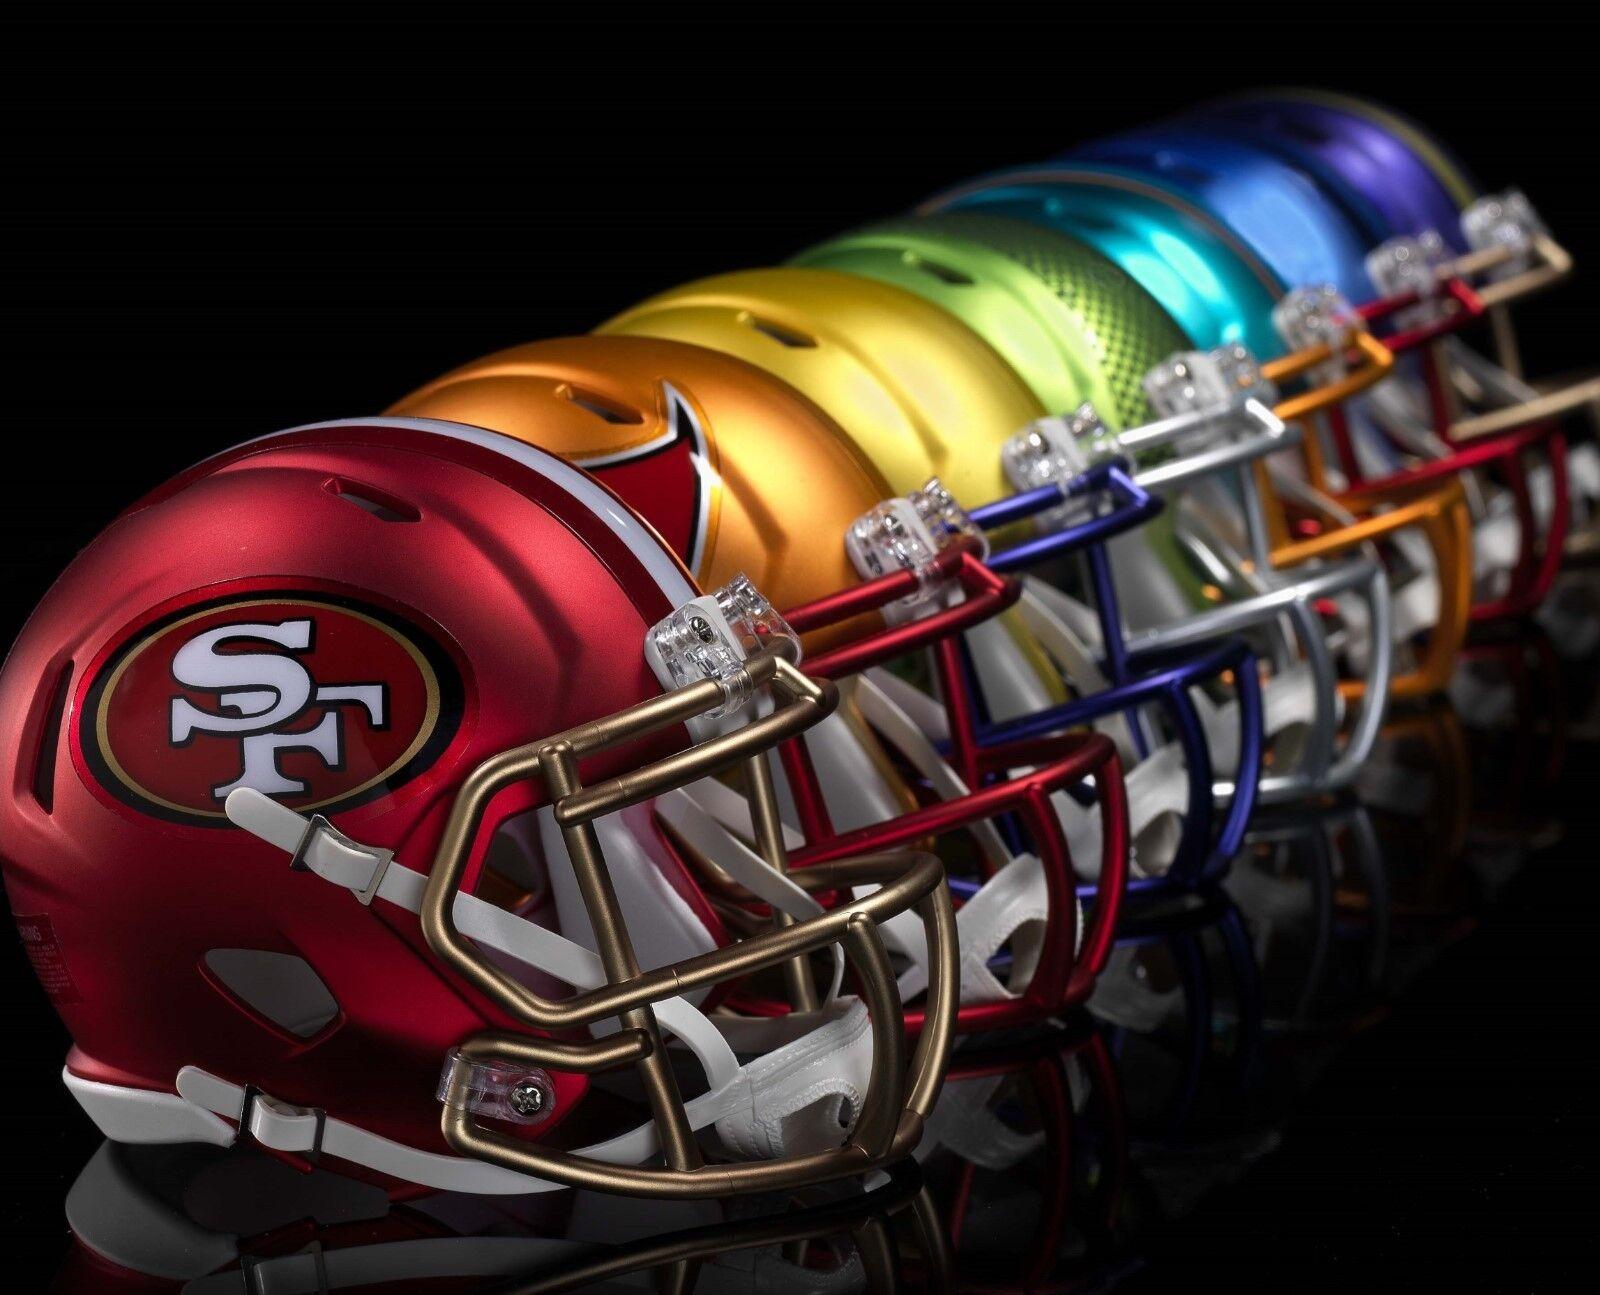 pick team sticker helmet shaped nfl blaze